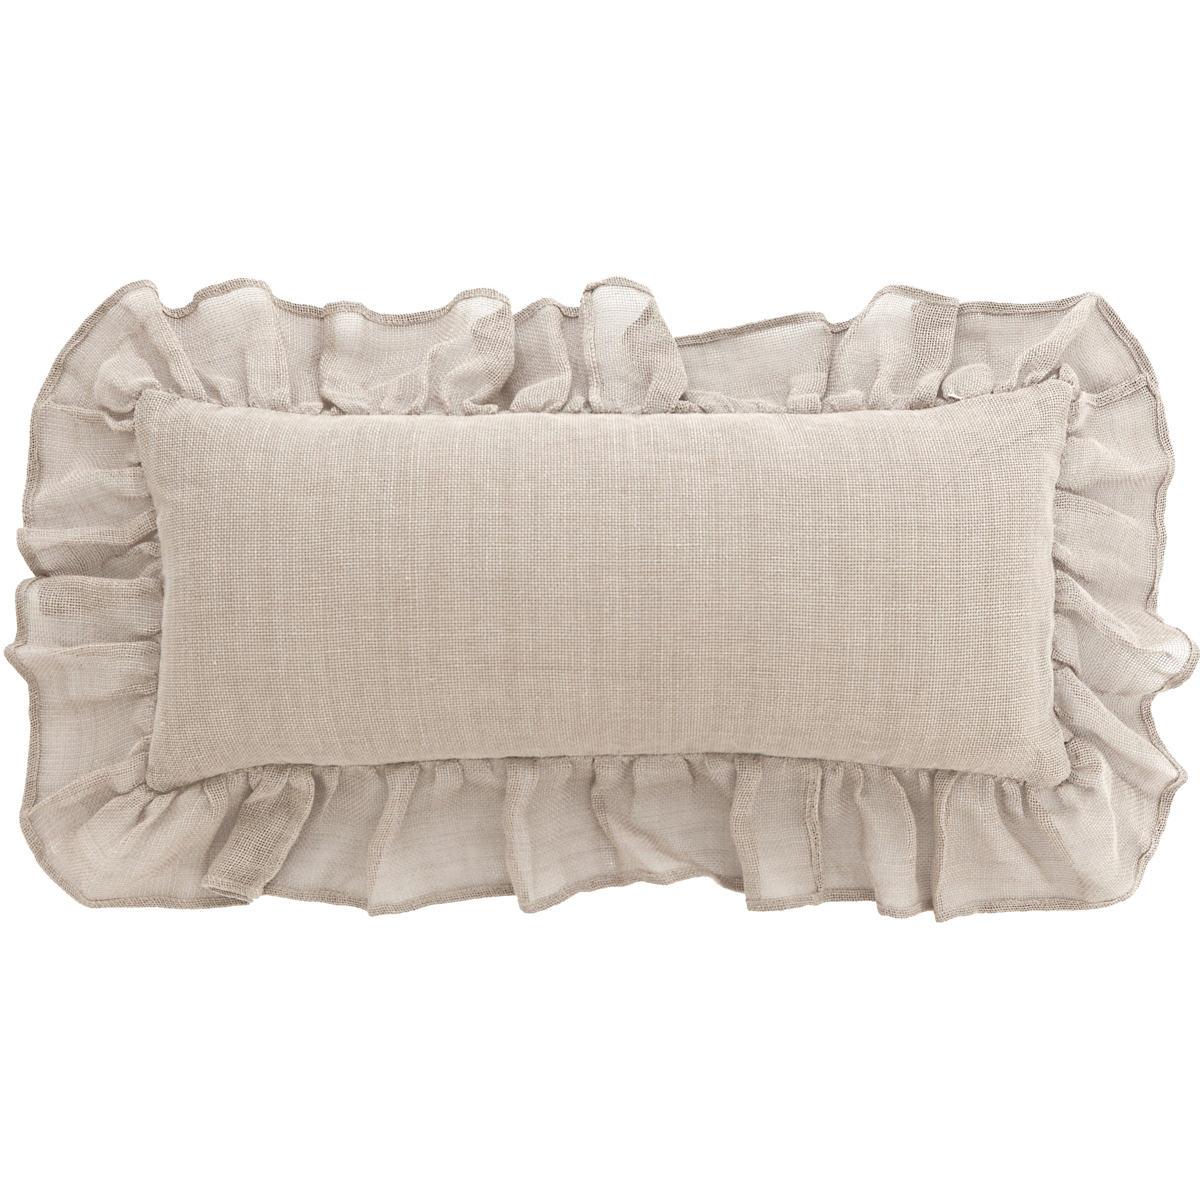 Linen Mesh Natural Decorative Pillow